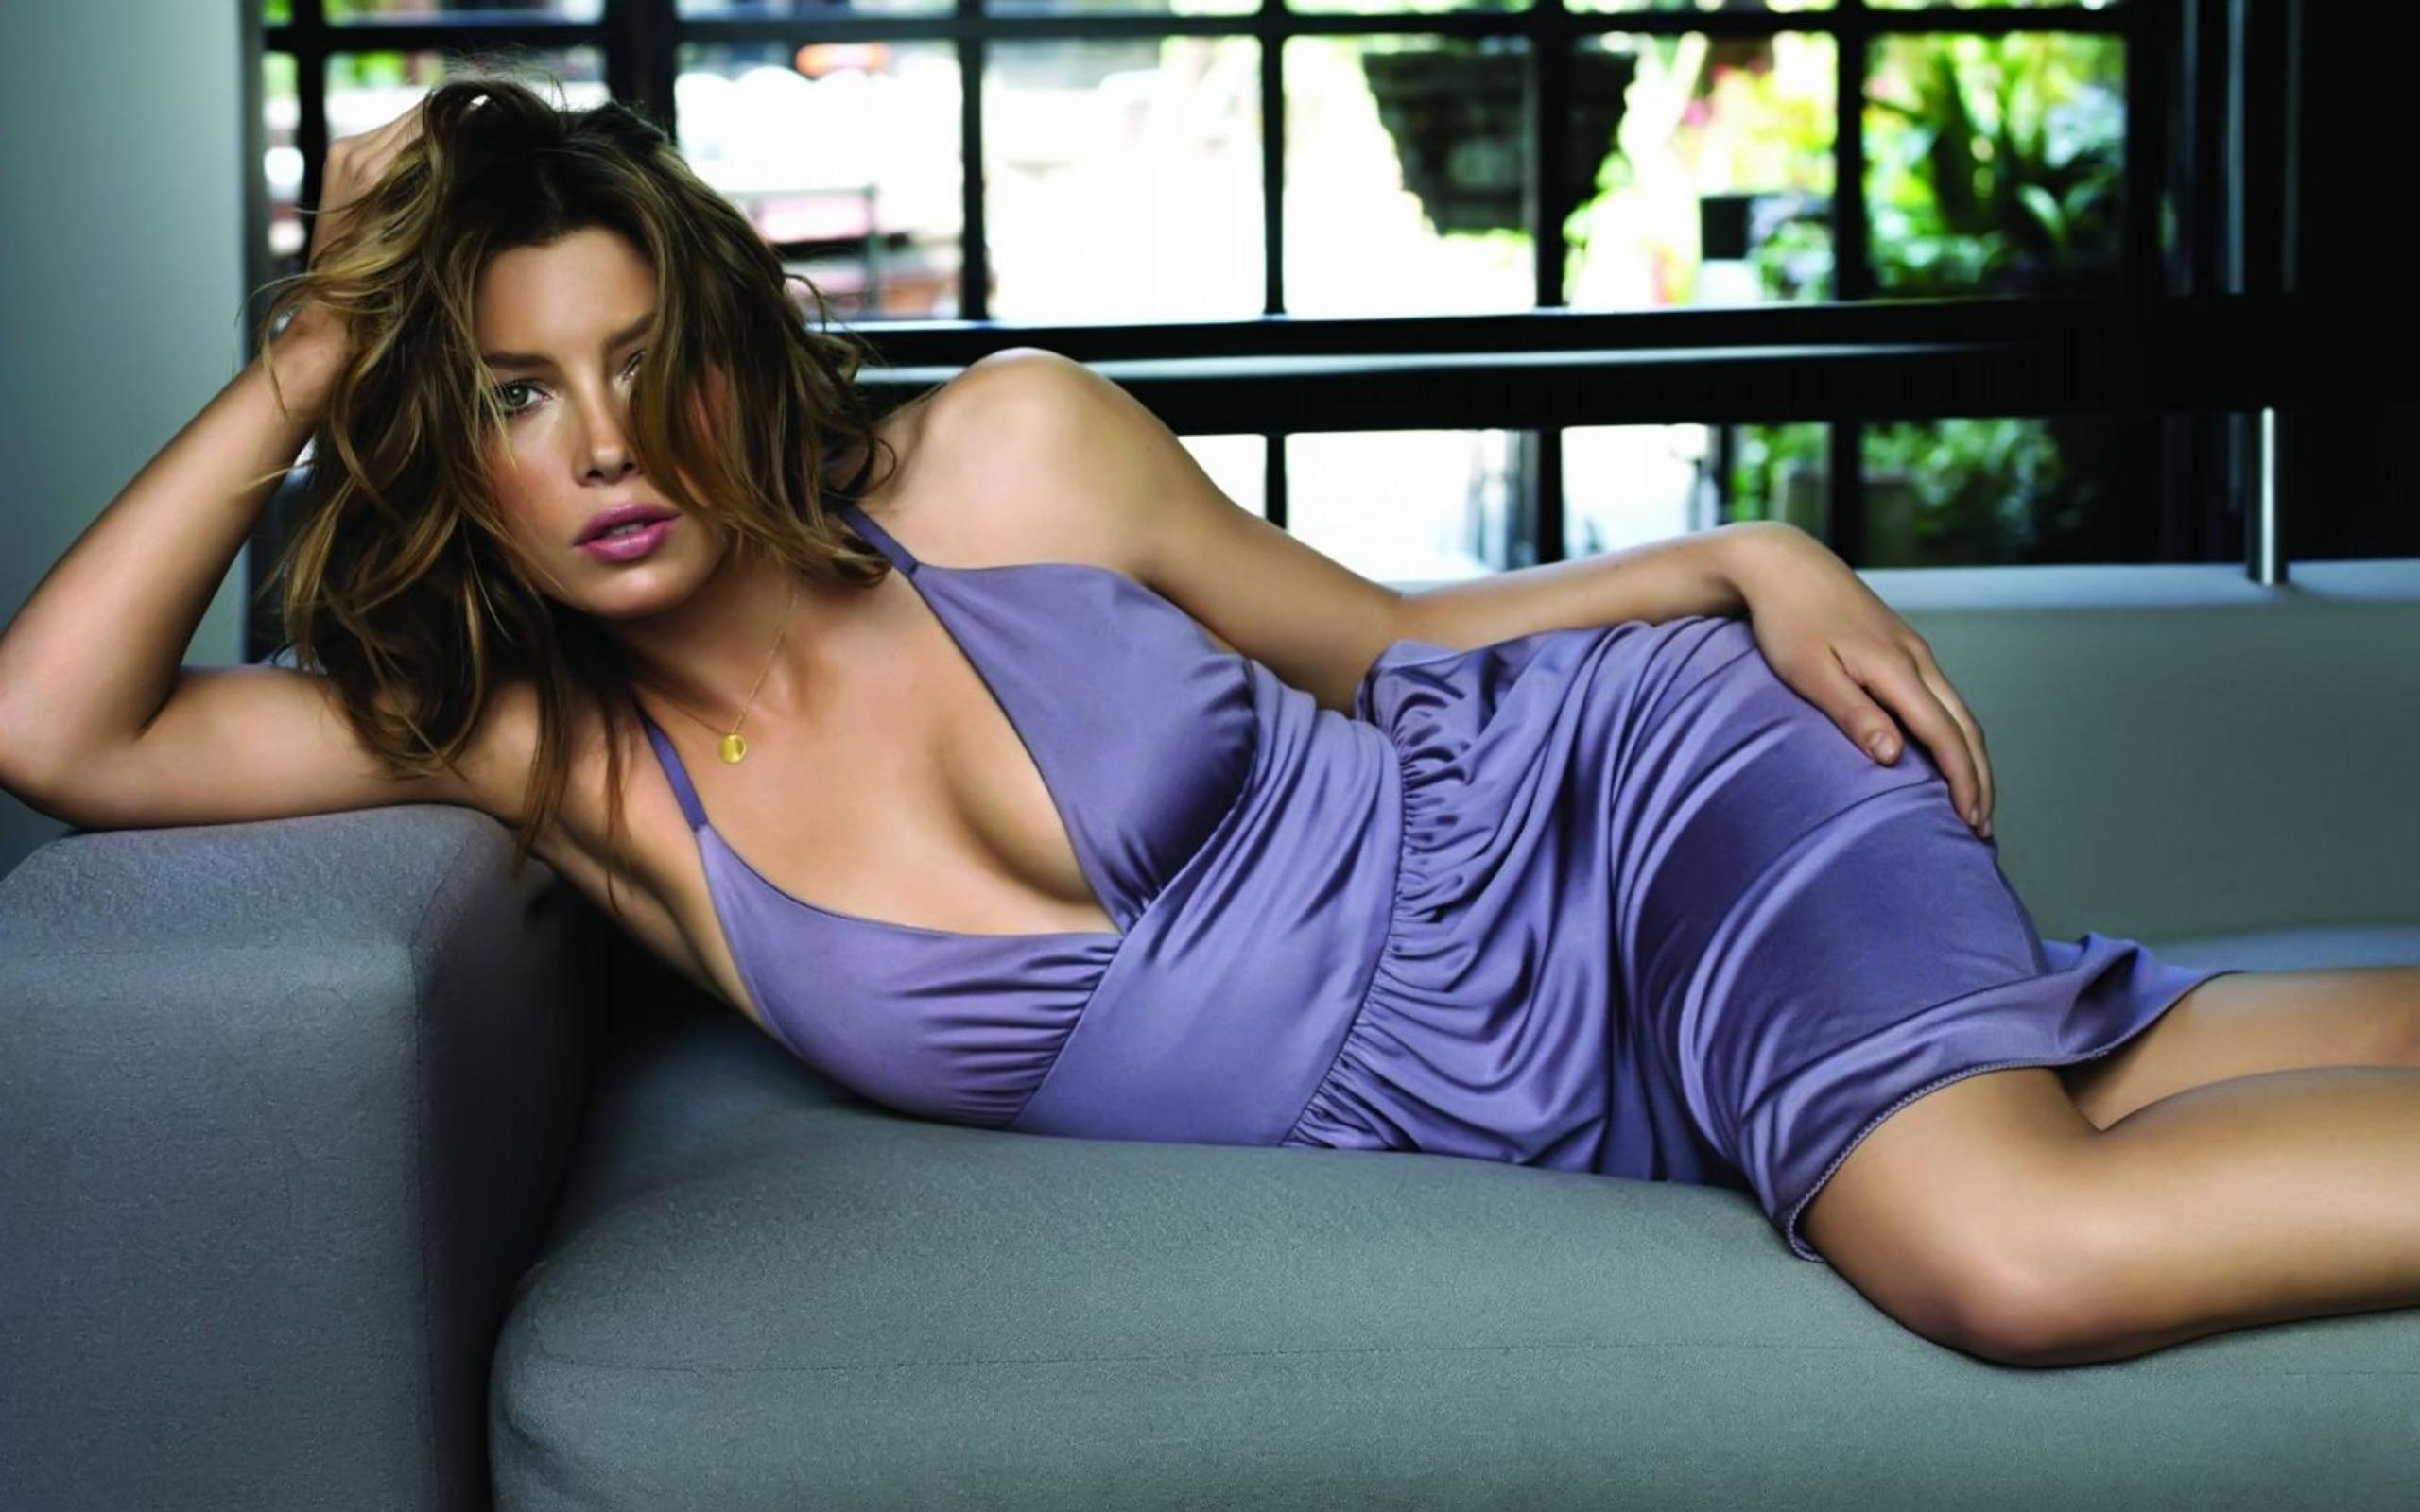 Erotica Jessica Biel nude photos 2019